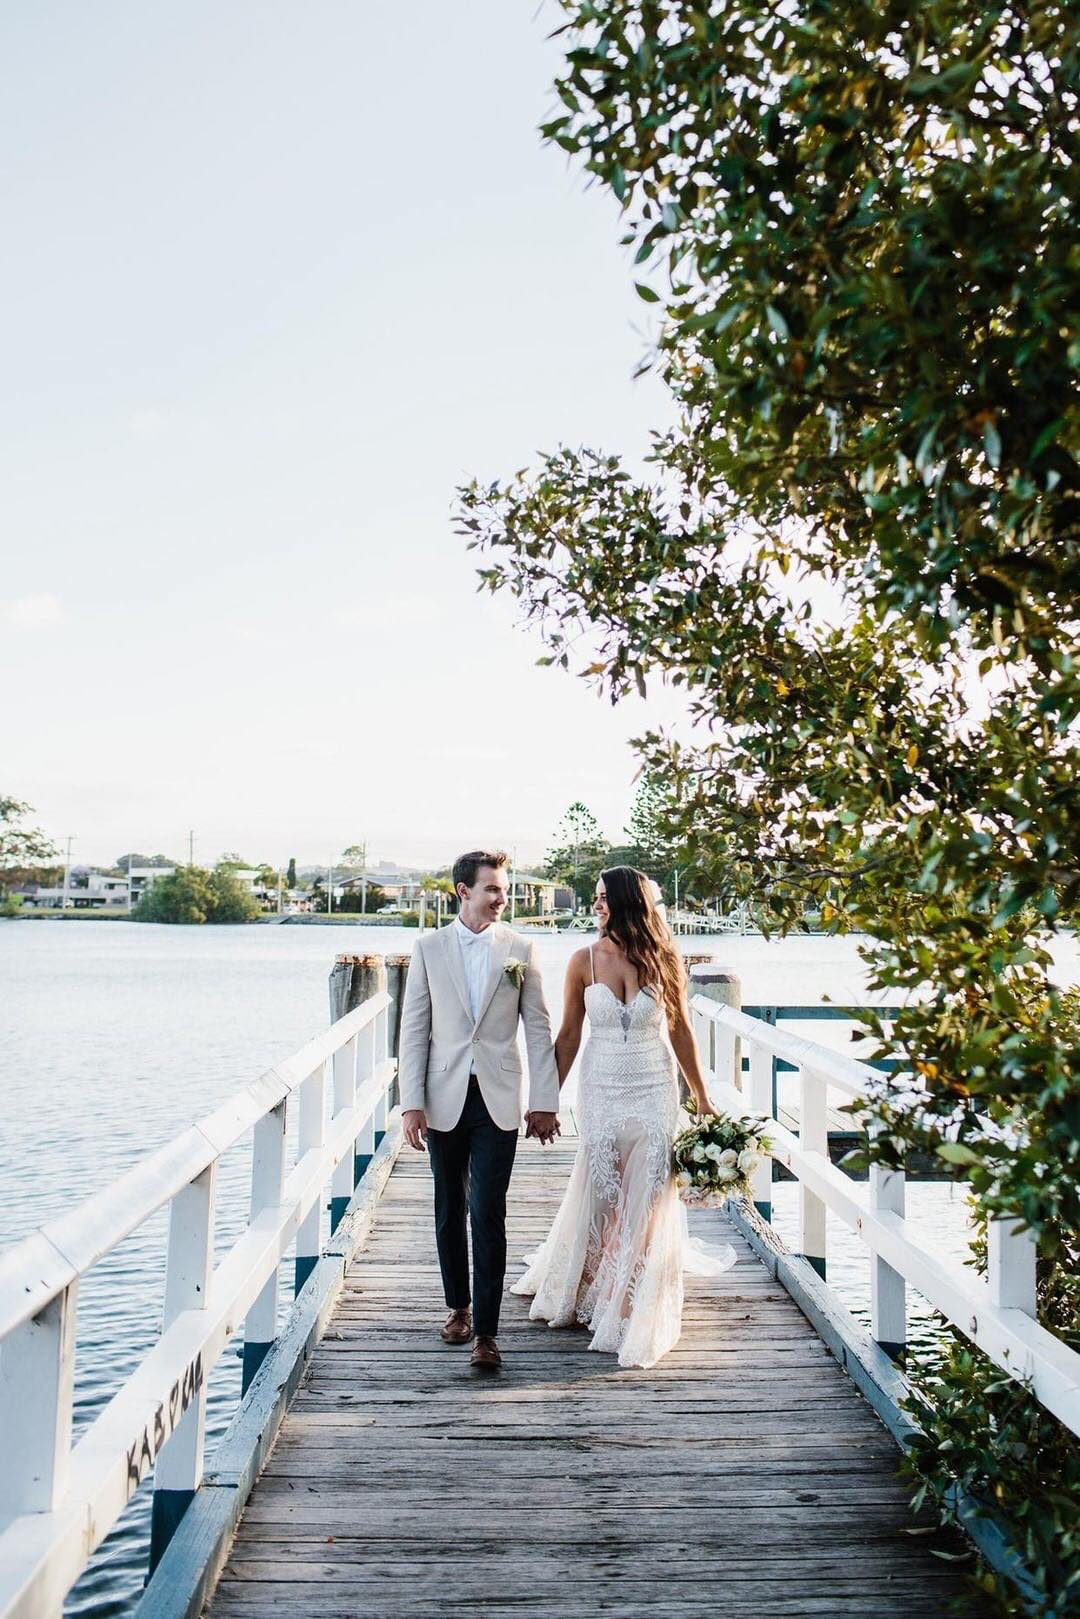 Yasmine Calla Blanche L'amour Wedding Dresses Sydney Online Australia Afterpay